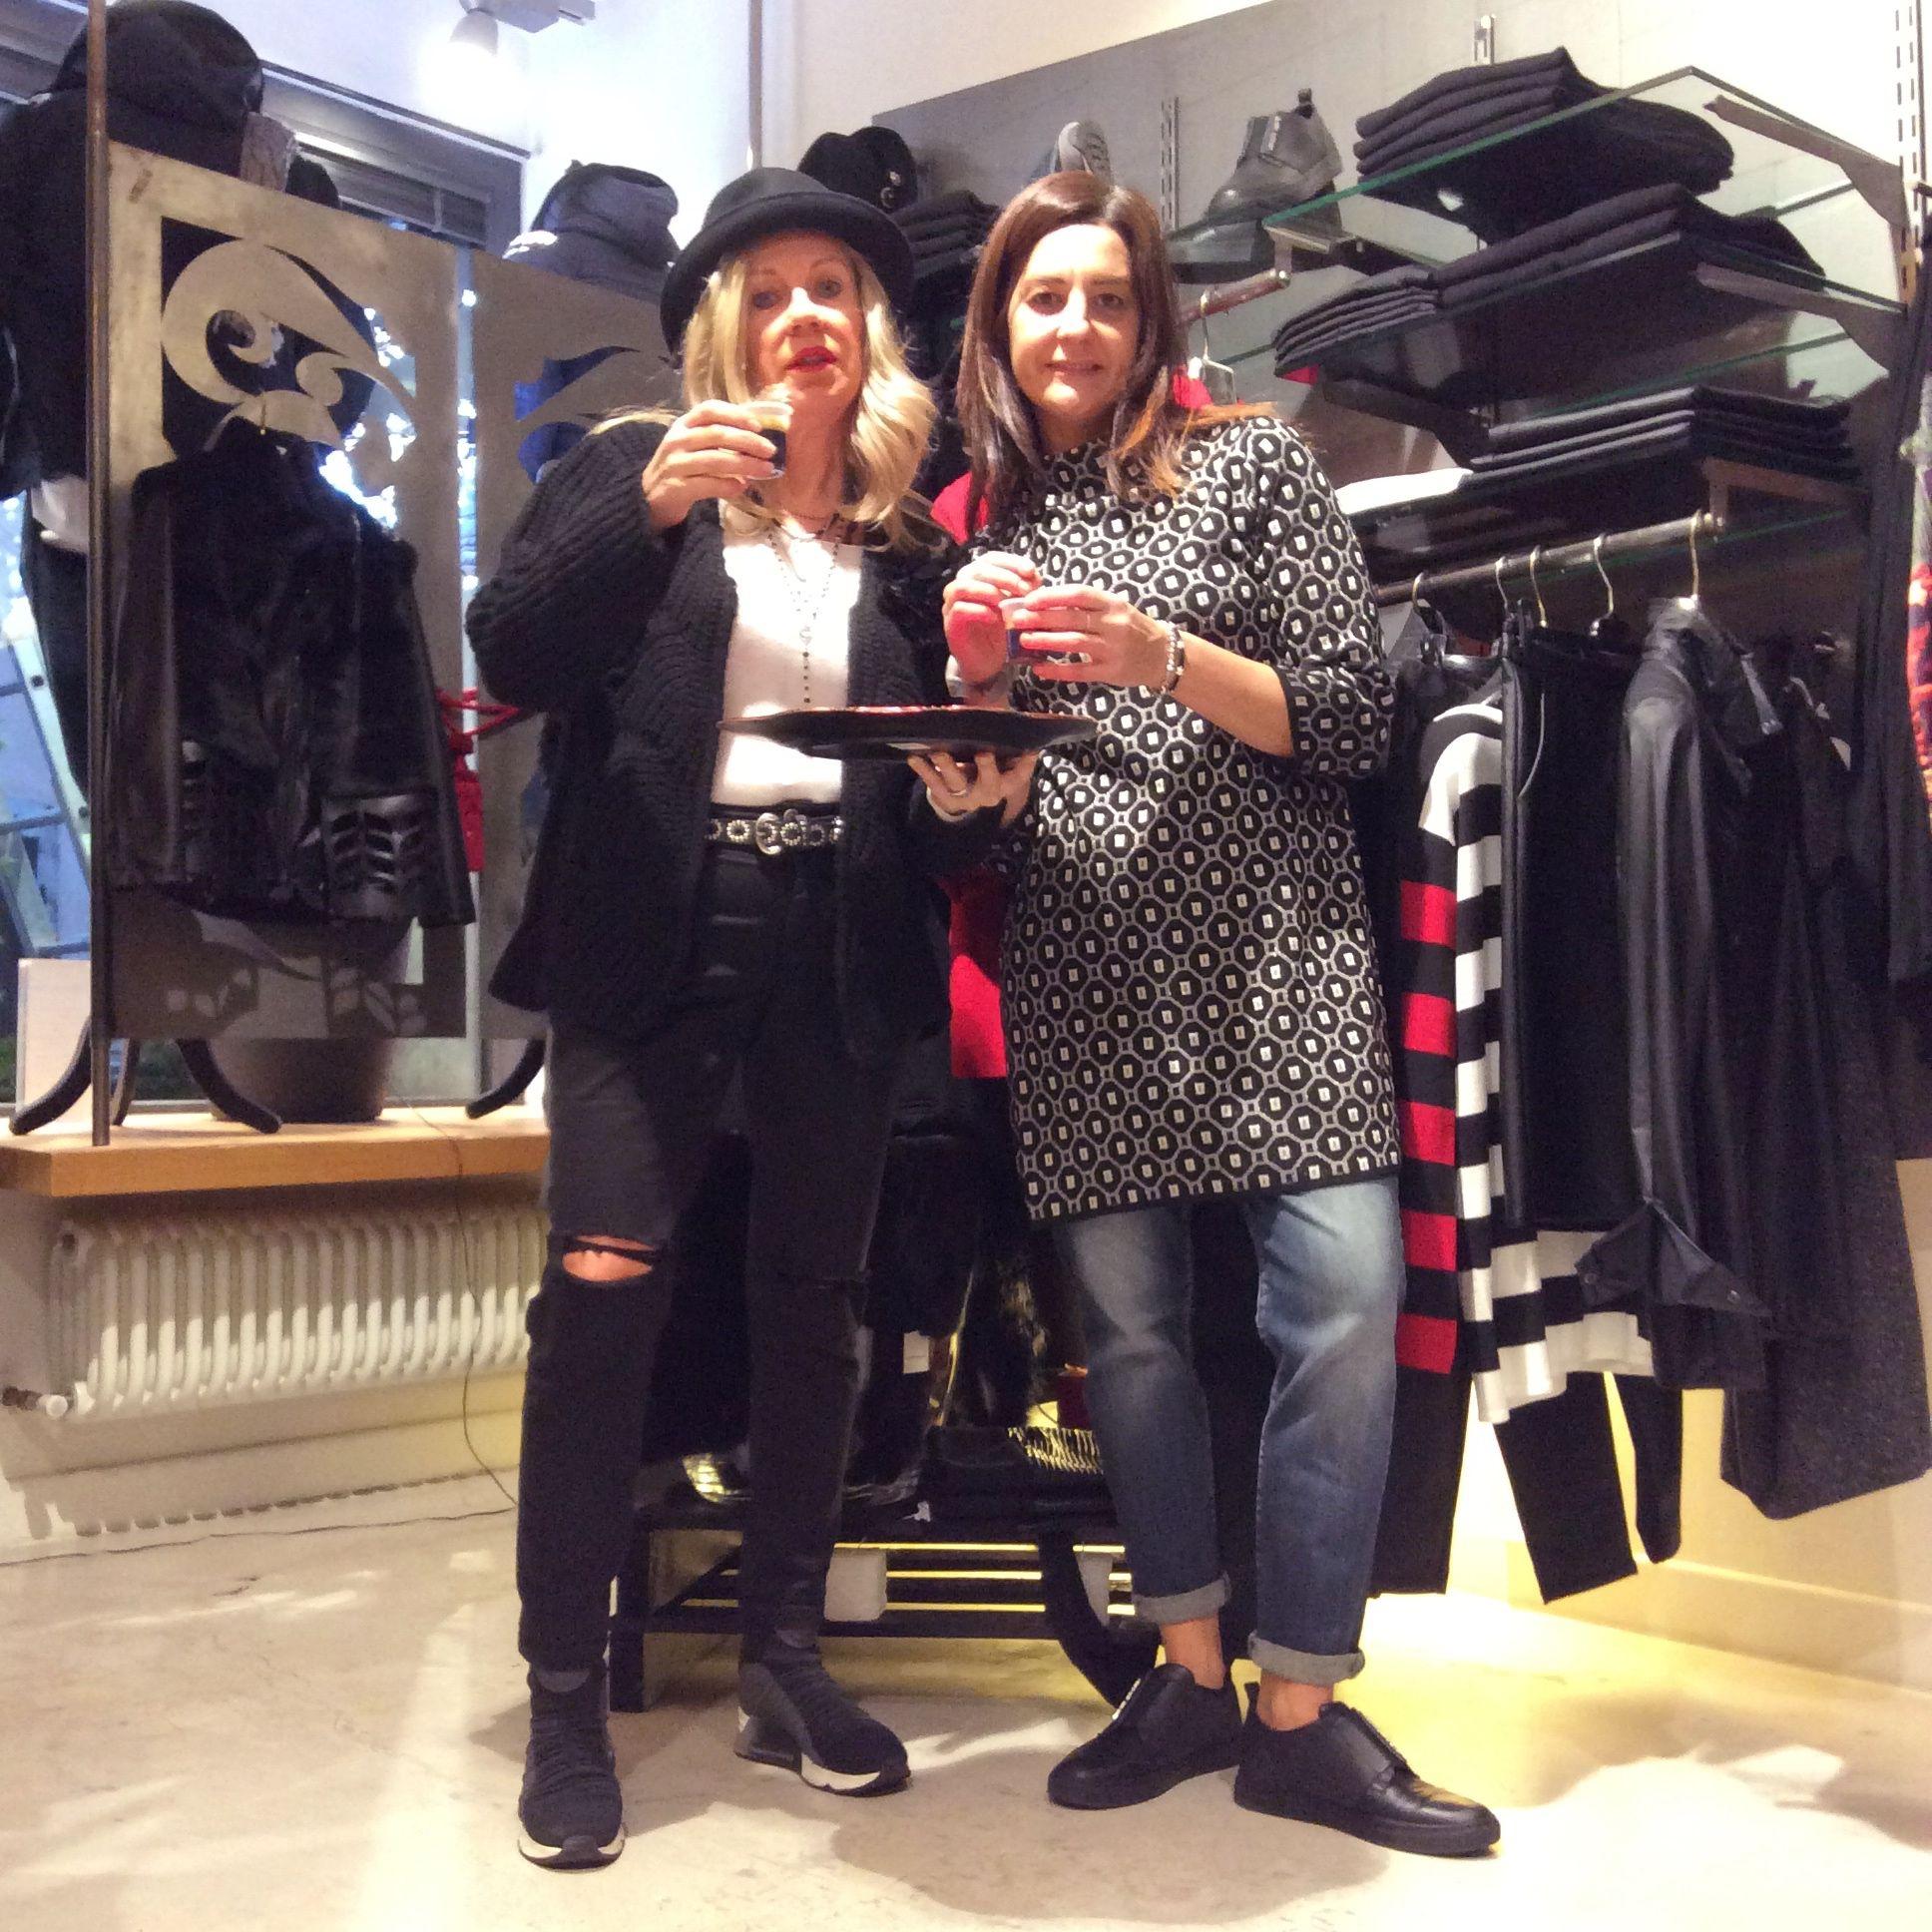 Buongiorno a voi!!! Un buon Caffè vi aspetta☕️☕️☕️ #orgogliodiessereitaliano #italyintheworld #madeinitaly #fashion #styles #stylish  #model #glam #glamour #outfit #ootd #instagood #instafashion #shopping #today #tagsforlikes #todayimwearing #mylook #fashionista #instastyle #fashiongram #beautiful #accessories  #swag #cute #confezionimontibeller #borgovalsugana #trentino #livelovevalsugana  http://www.confezionimontibeller.it